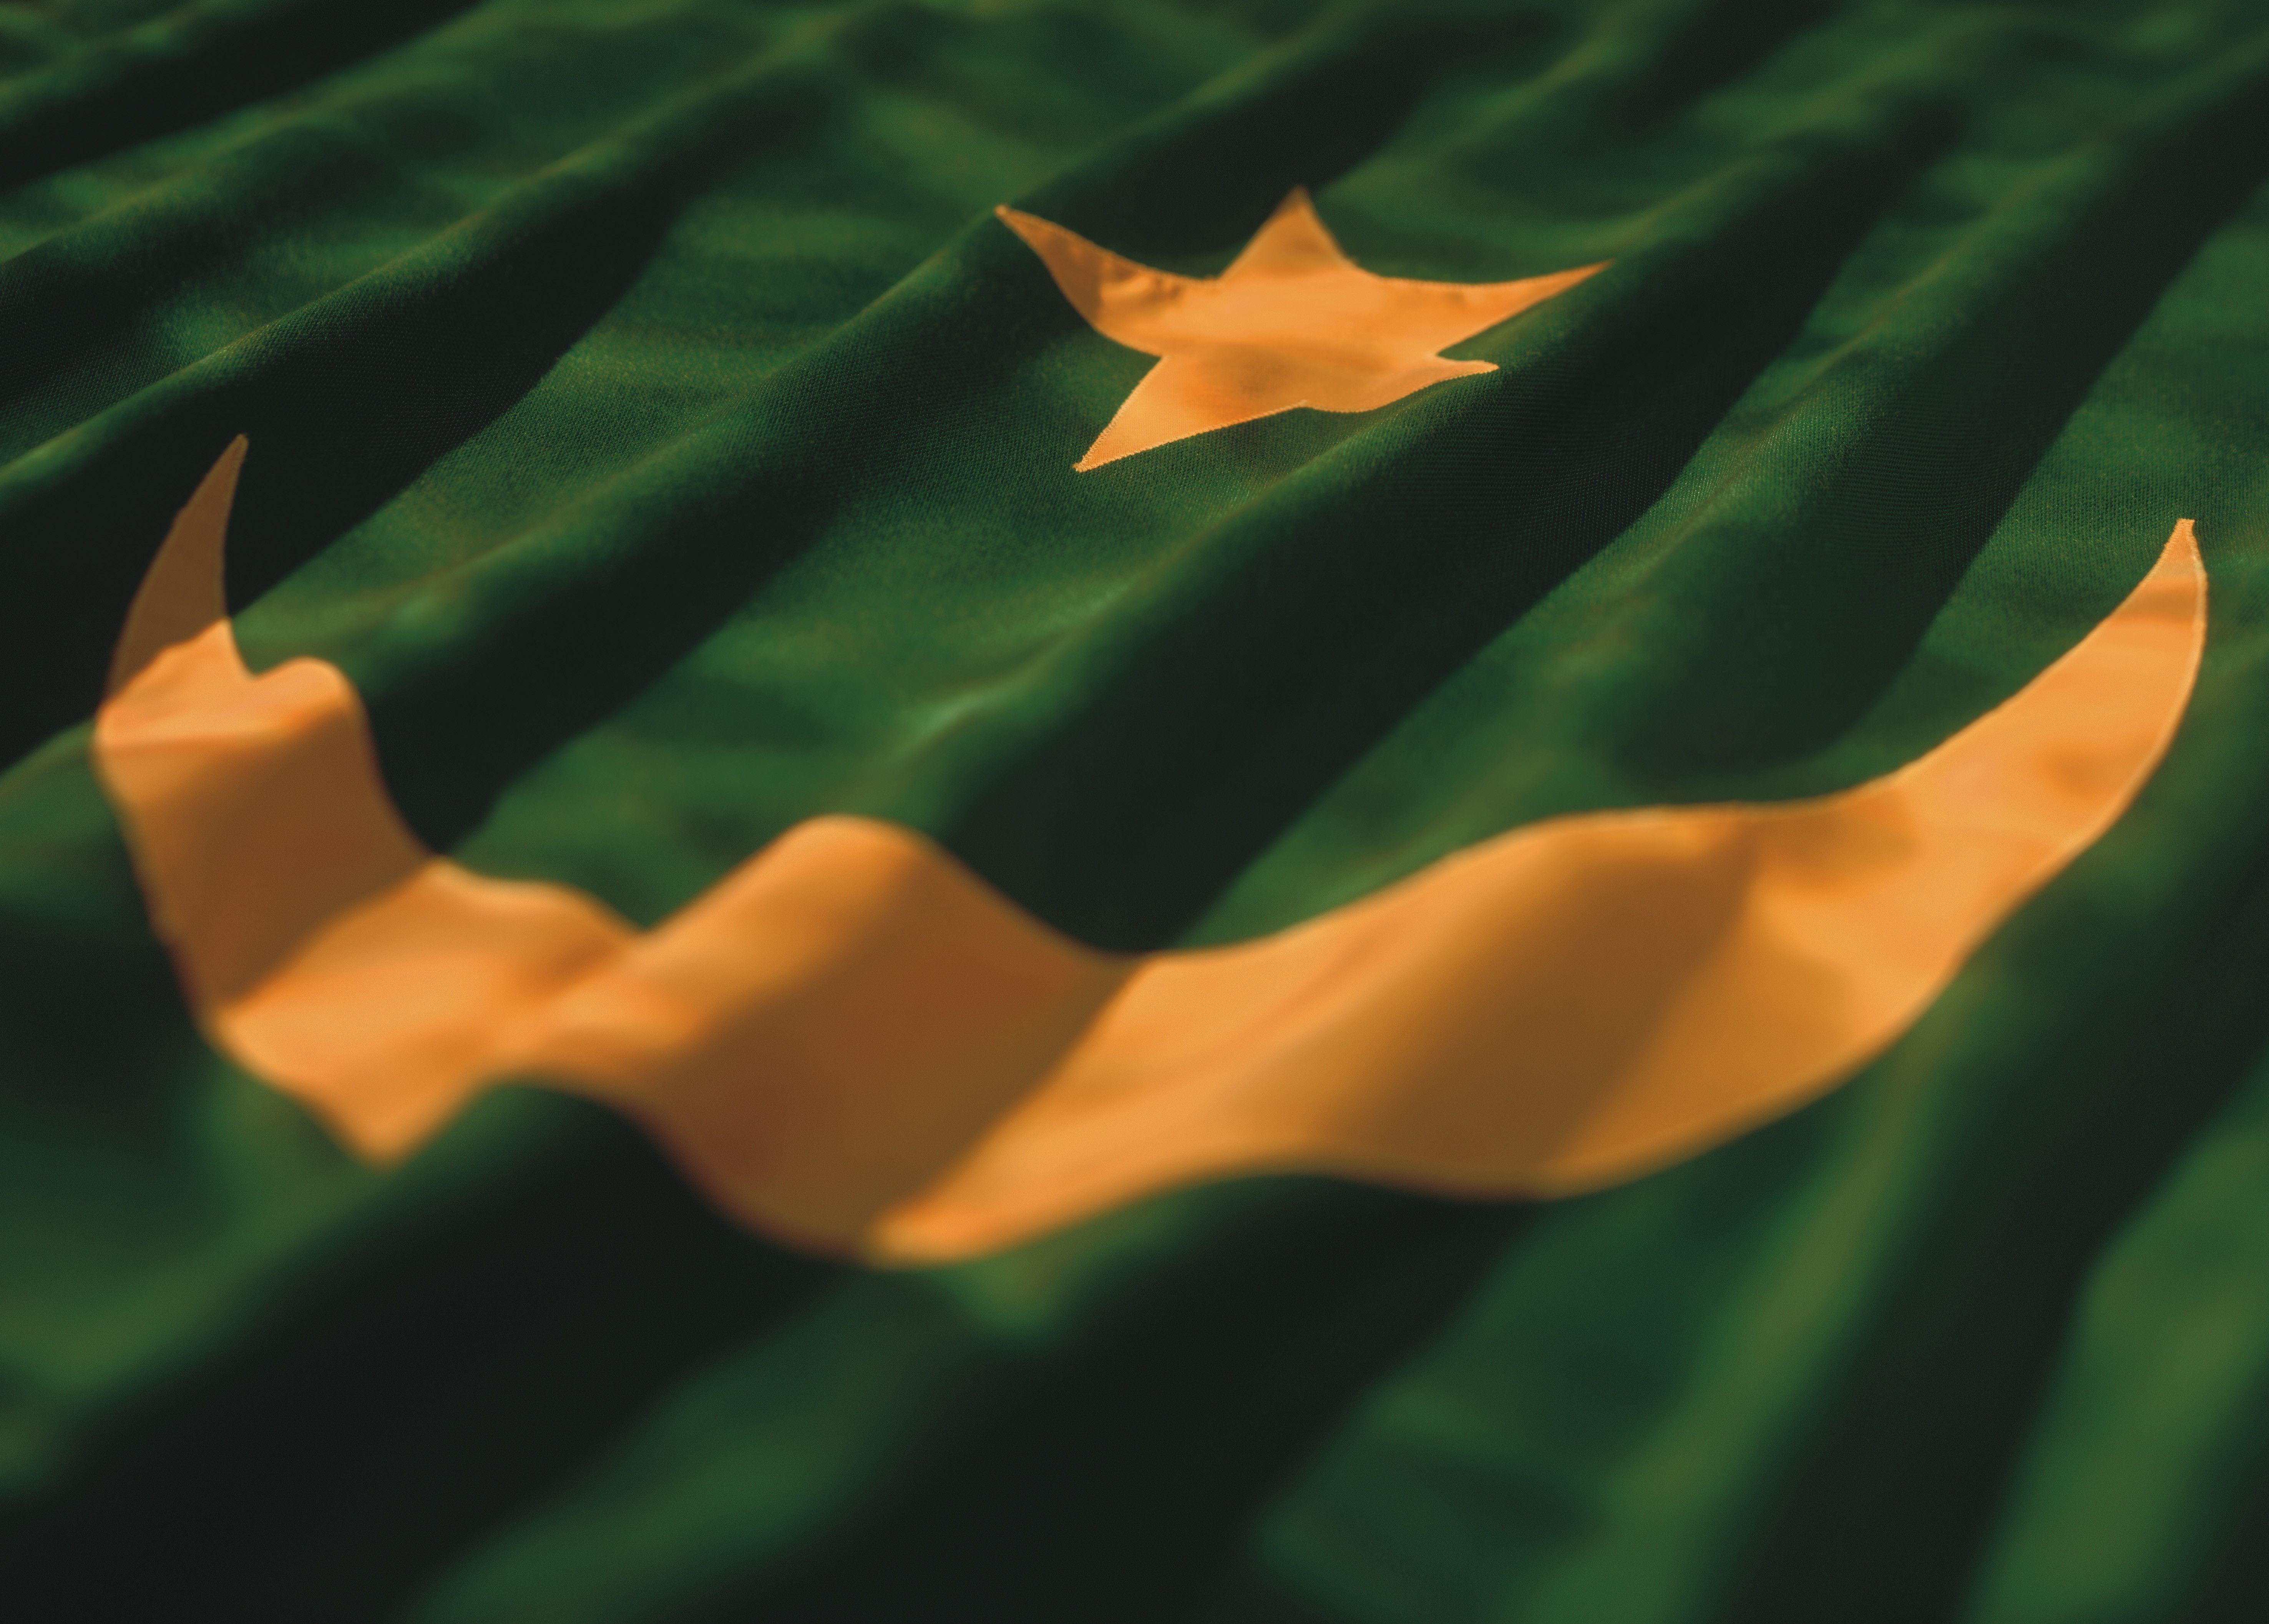 close-up of the flag of Mauritania